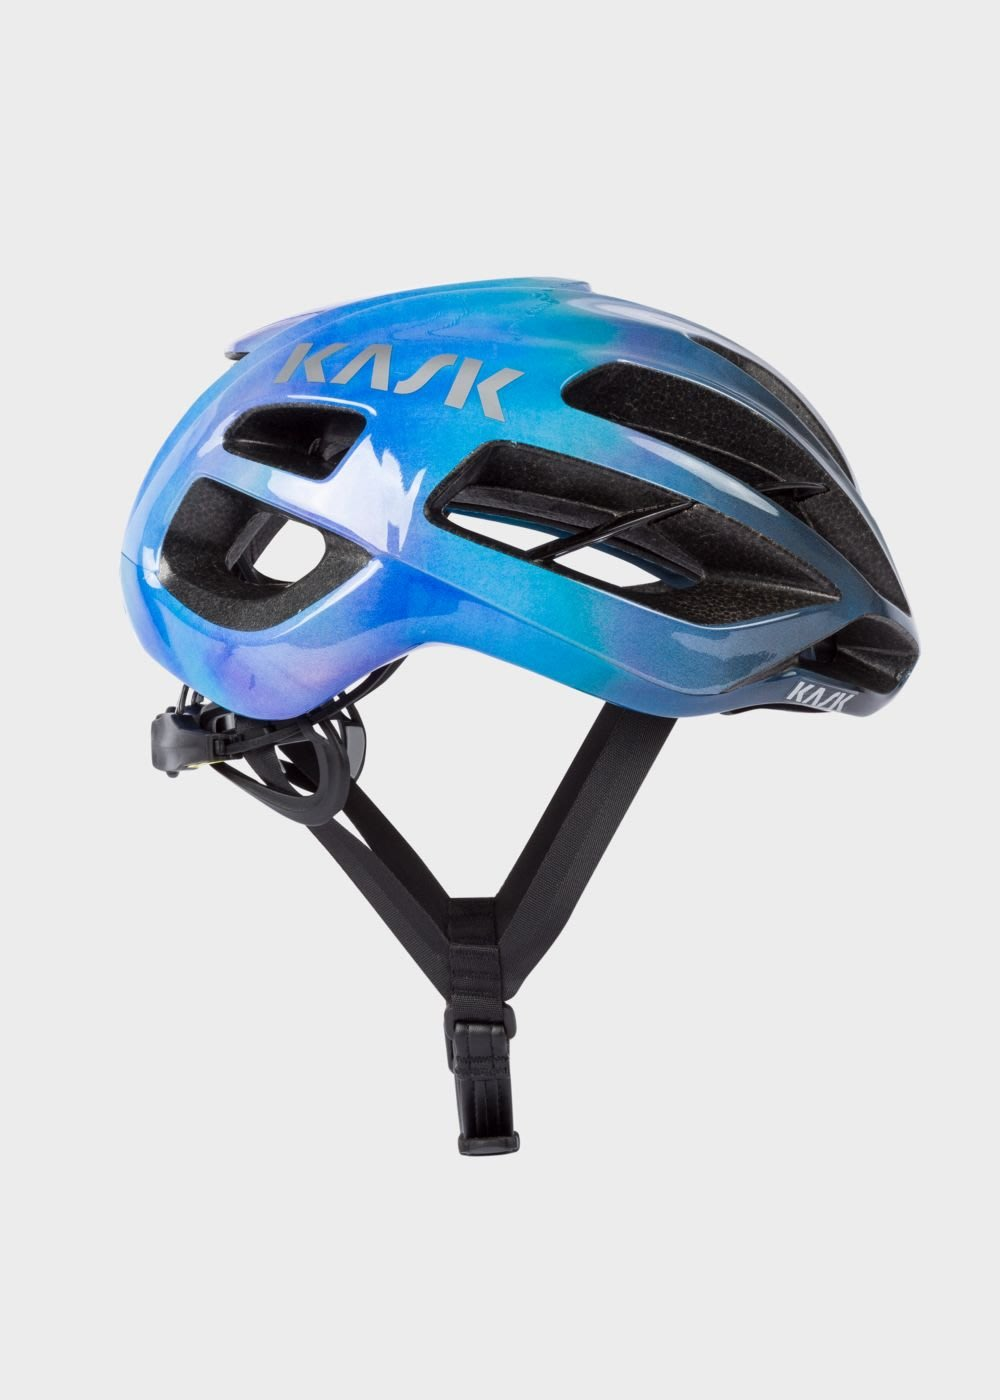 [英國代購服務] Paul Smith + Kask Blue Gradient Protone Cycling 安全帽